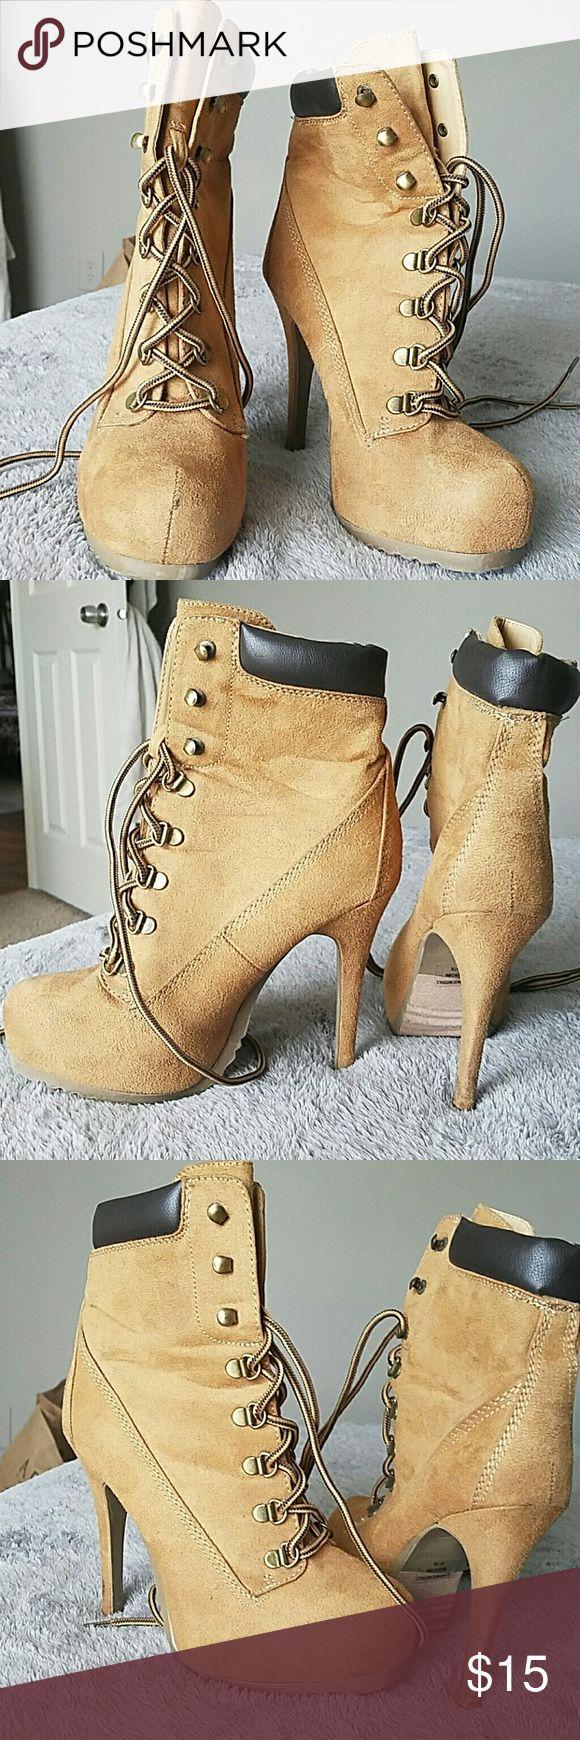 "High heel boots Rue21 ""Timberlake heels"" 2 inch platform  5 inch heel. Very comfortable . Rue 21 Shoes Ankle Boots & Booties"